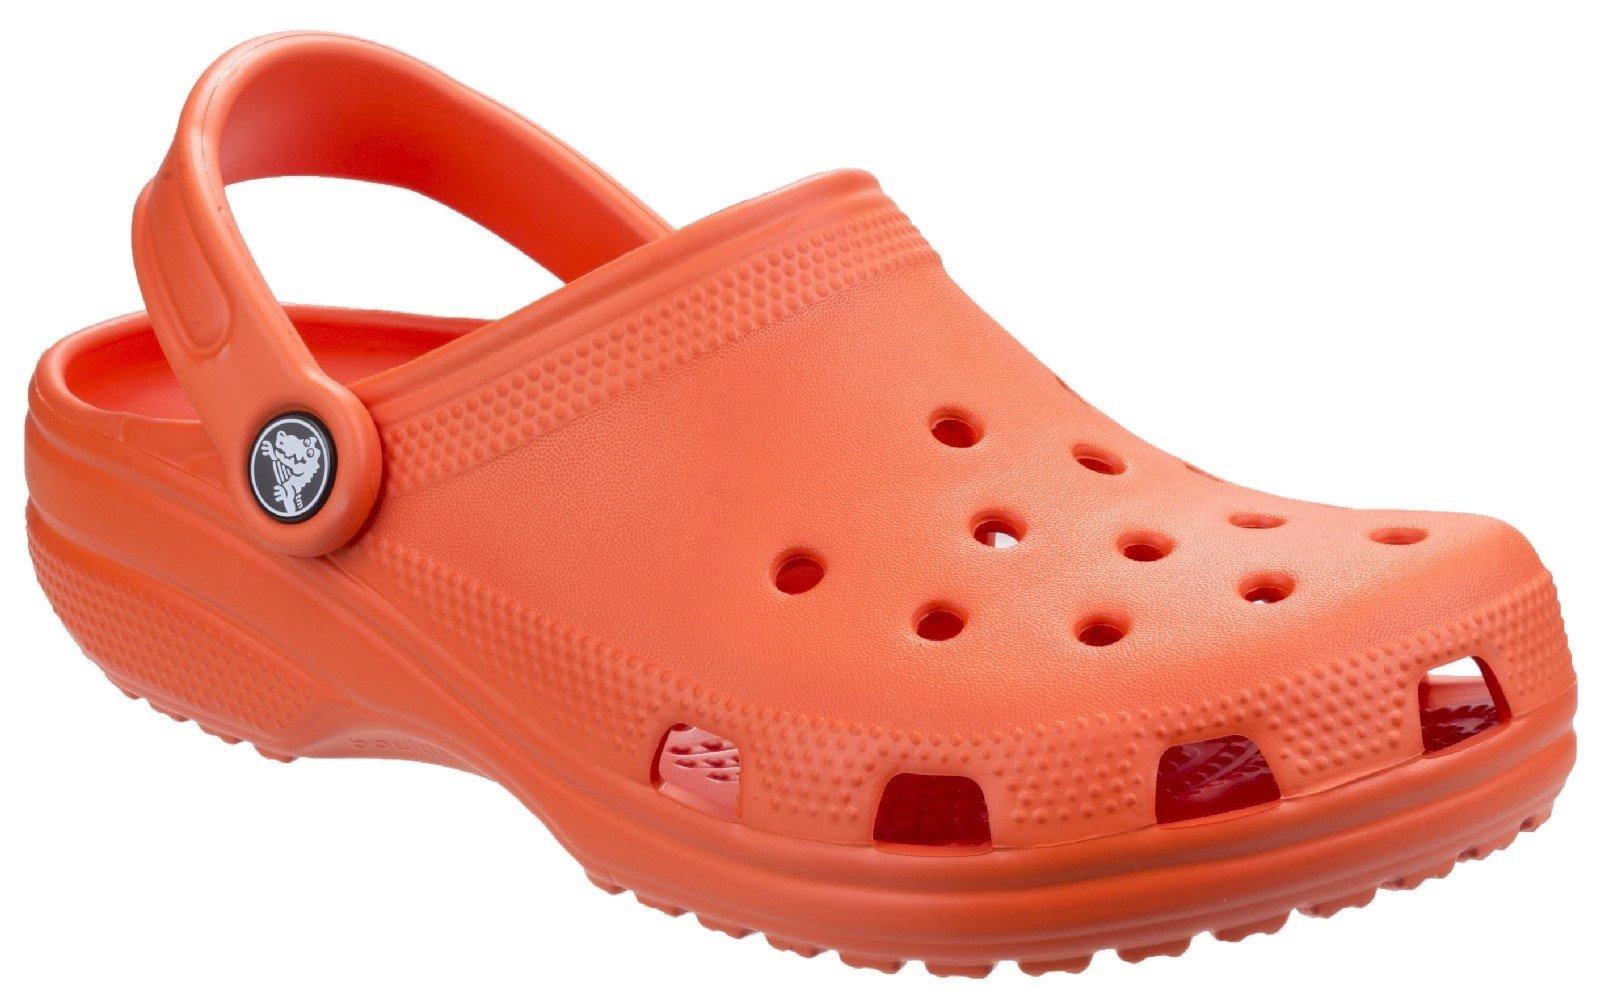 Crocs Women's Classic Clog Various Colours 21061 - Tanger 3